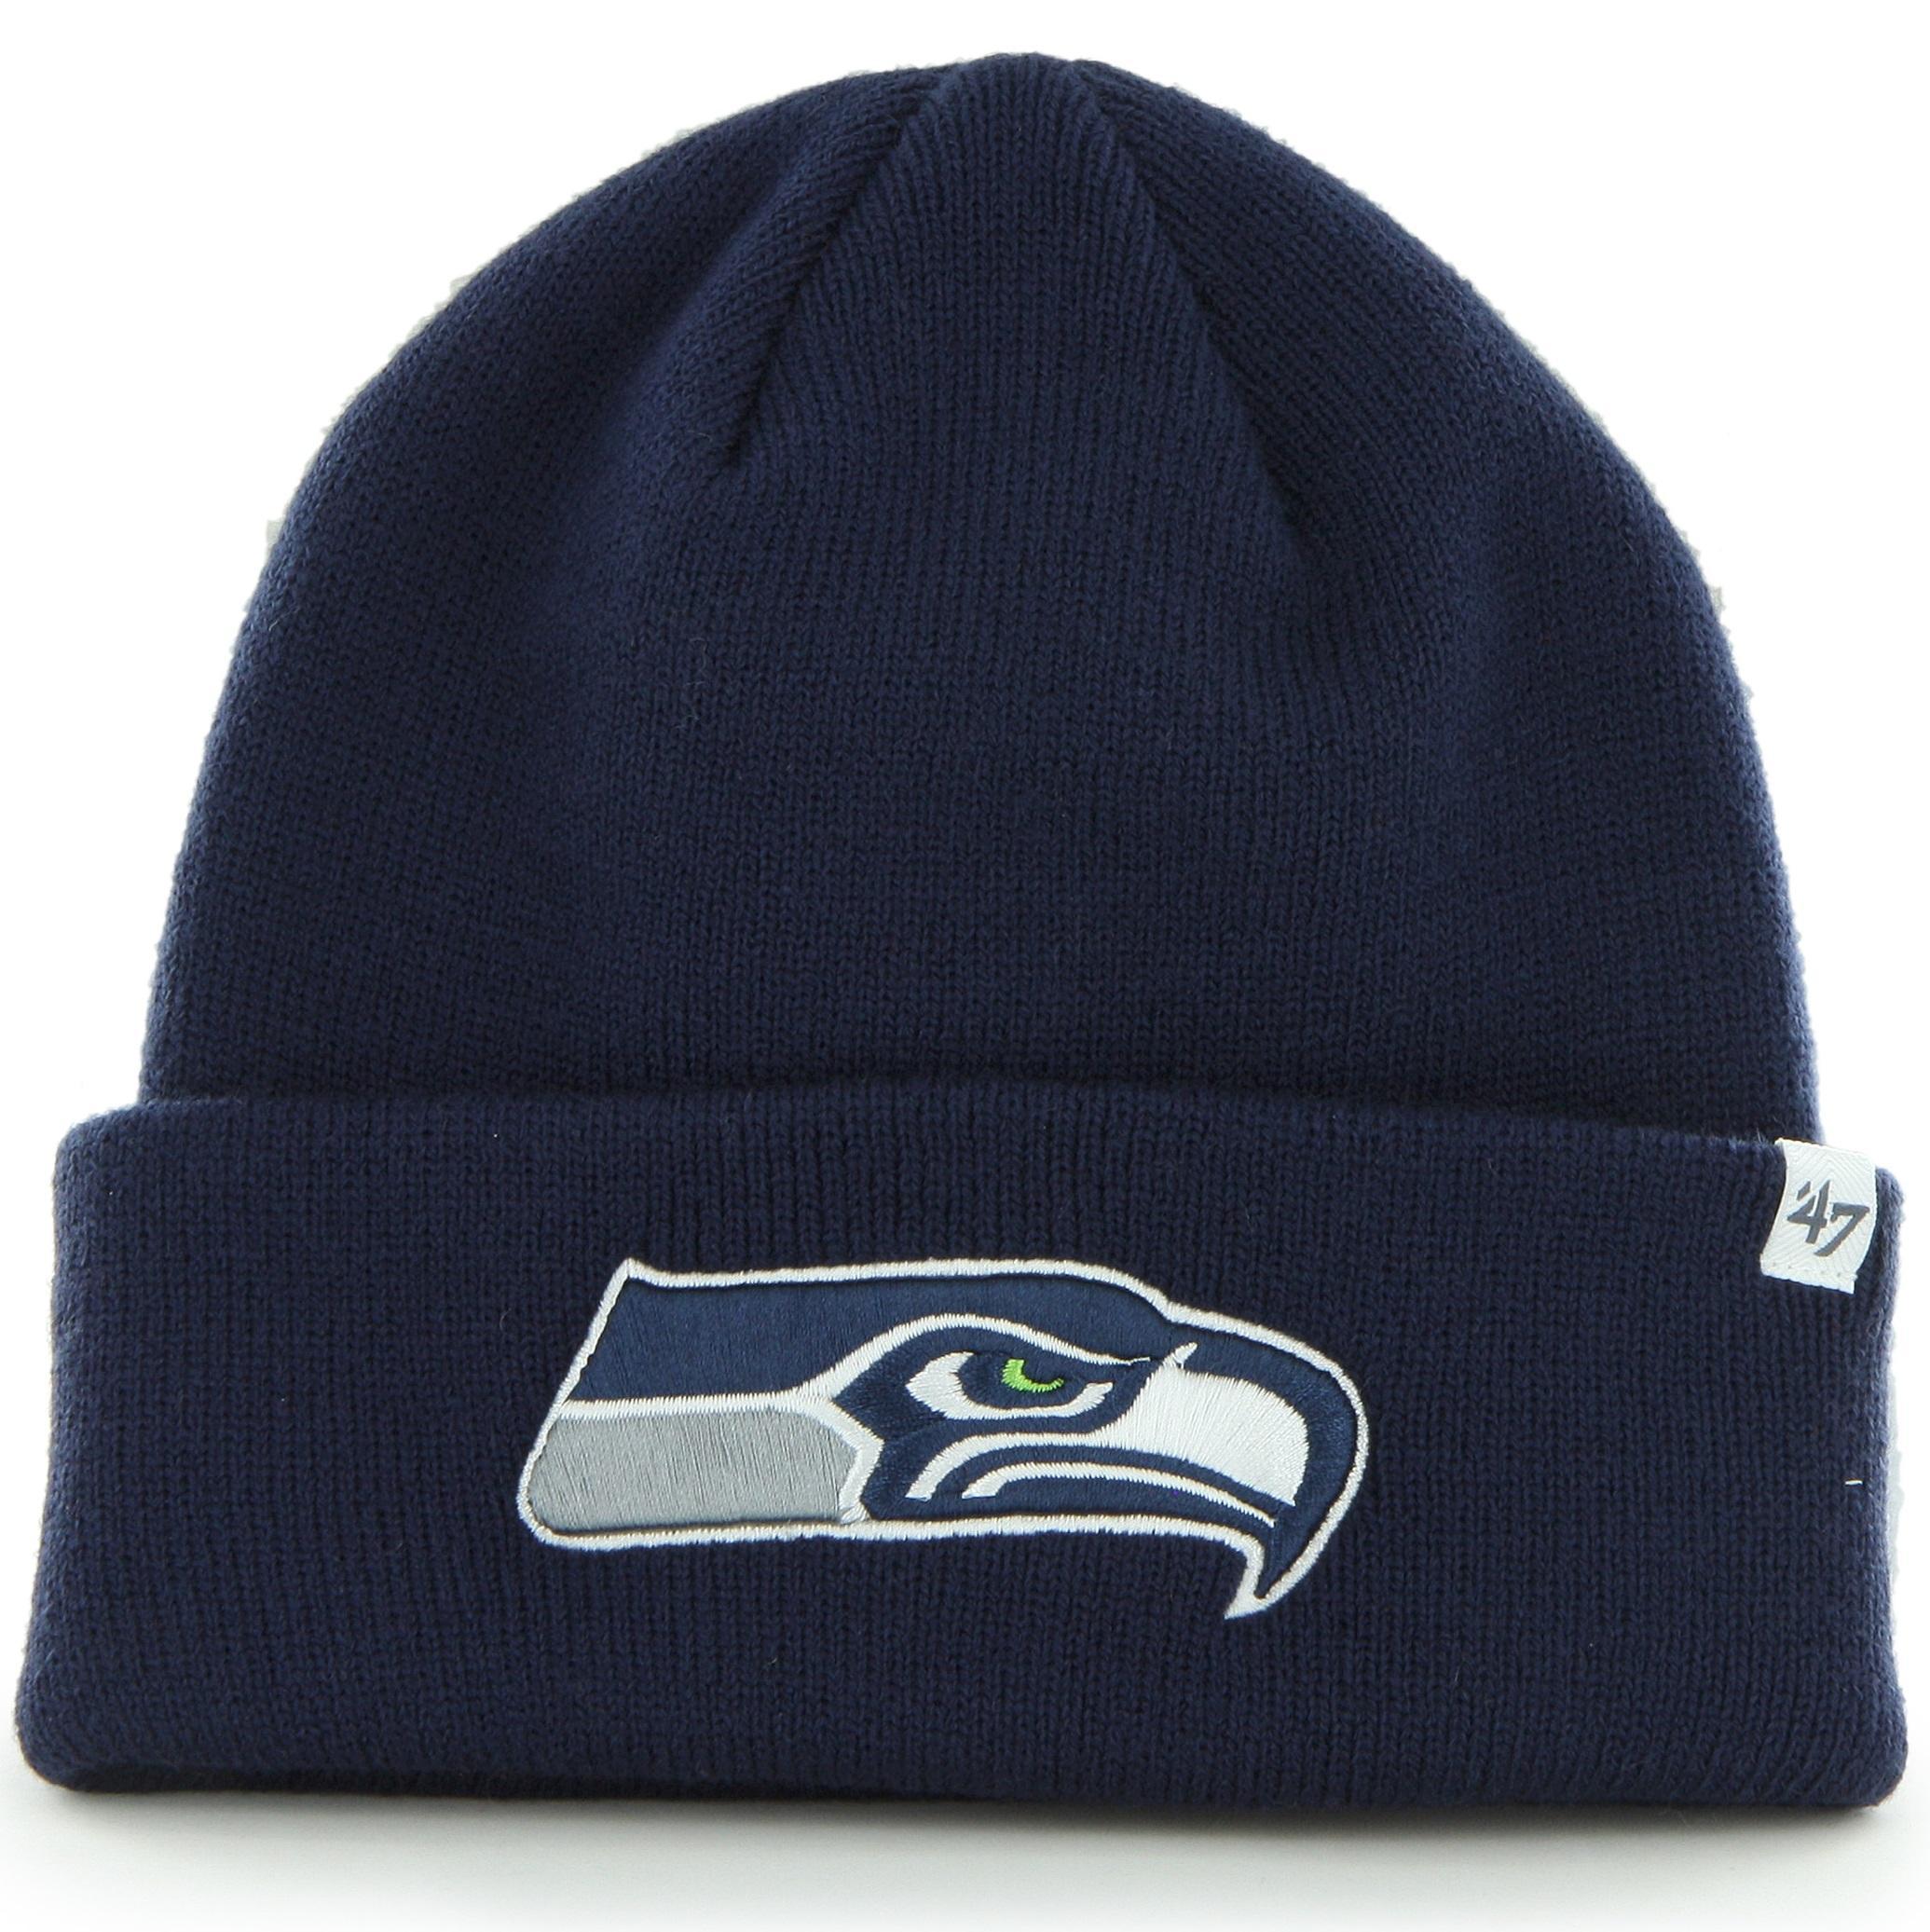 Amazon.com : 47 NFL Arizona Cardinals Raised Cuff Knit Hat, Black, One Size : Sports  Outdoors